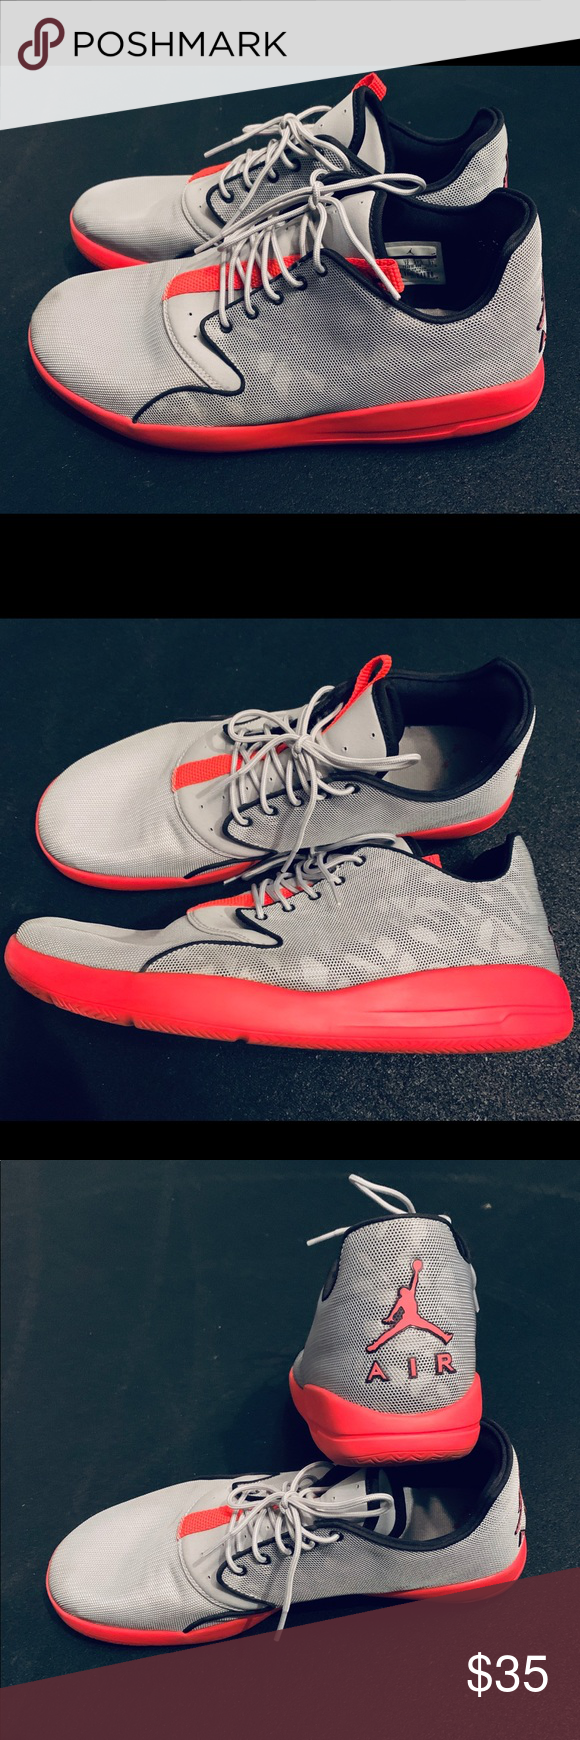 13. Nike Air Jordan Eclipse. Mens Size